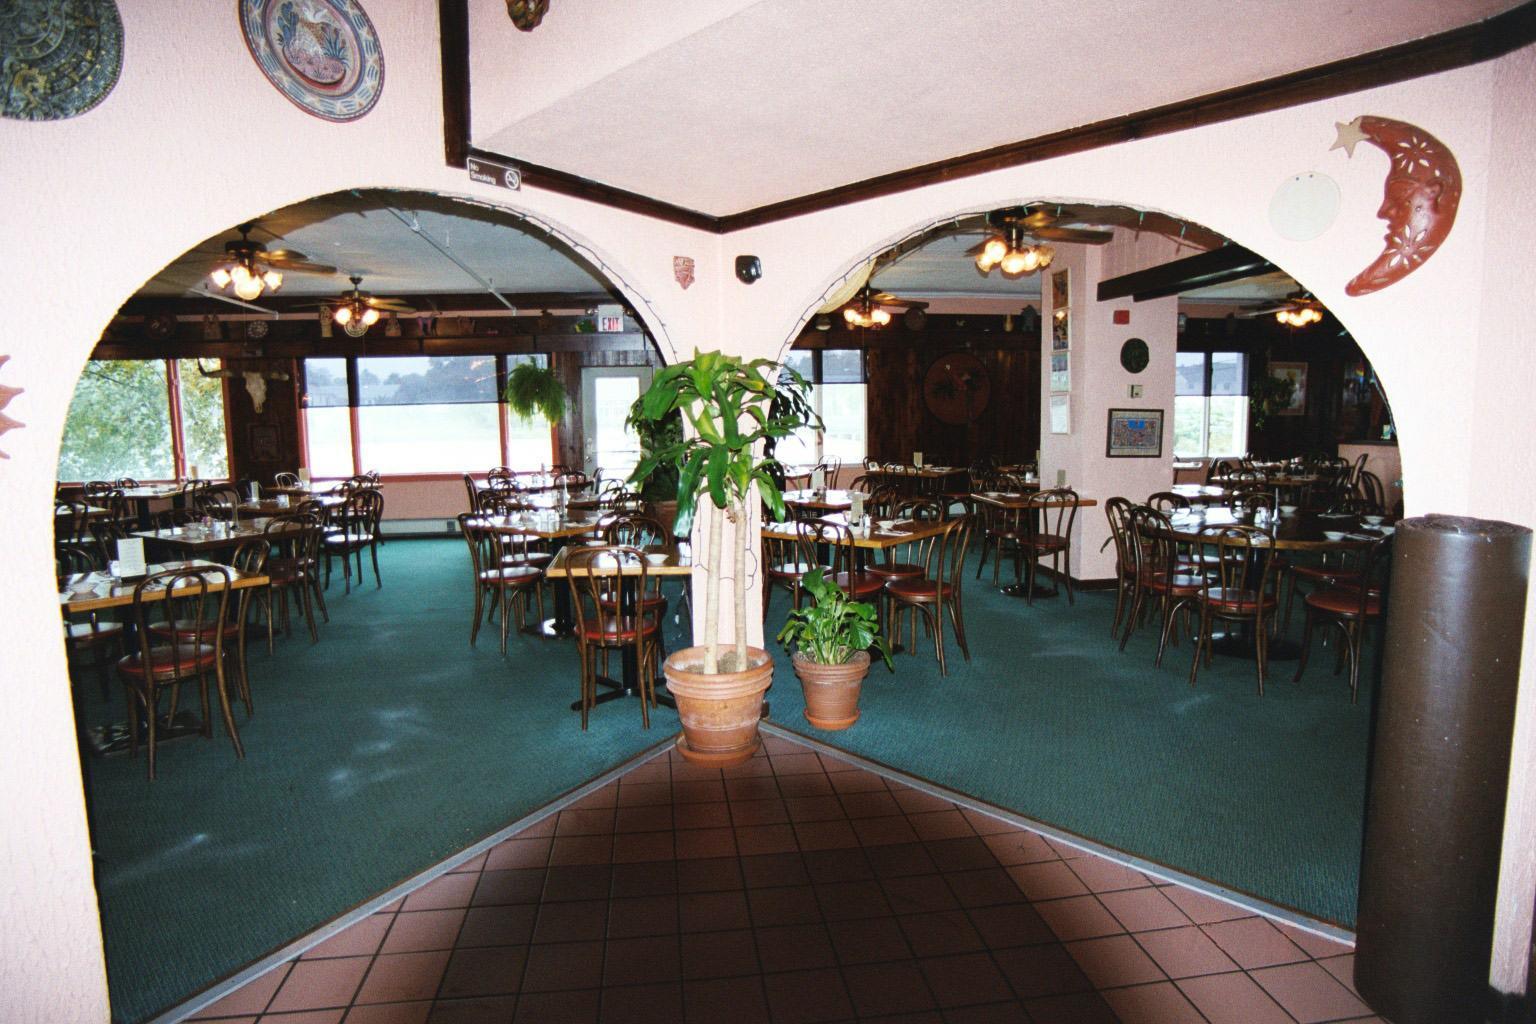 Casa Comida Mexican Restaurant 336 Branchport Ave Long Branch Nj 07740 Yp